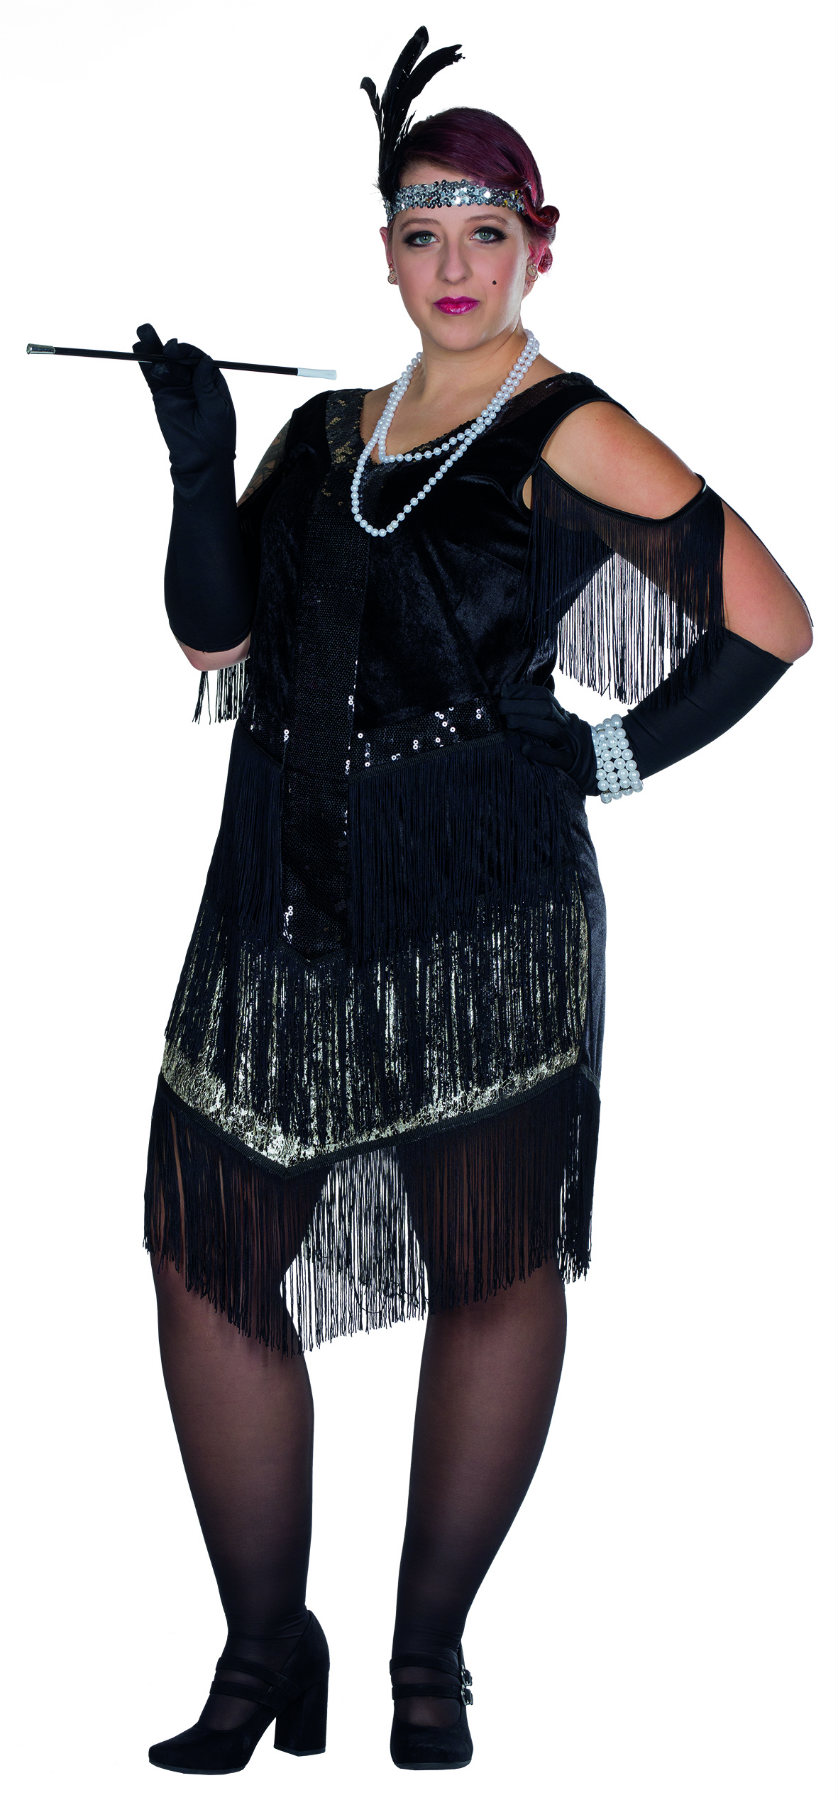 kostüm charleston kleid 20er jahre flapper krimi große größen karneval  silvester | ebay